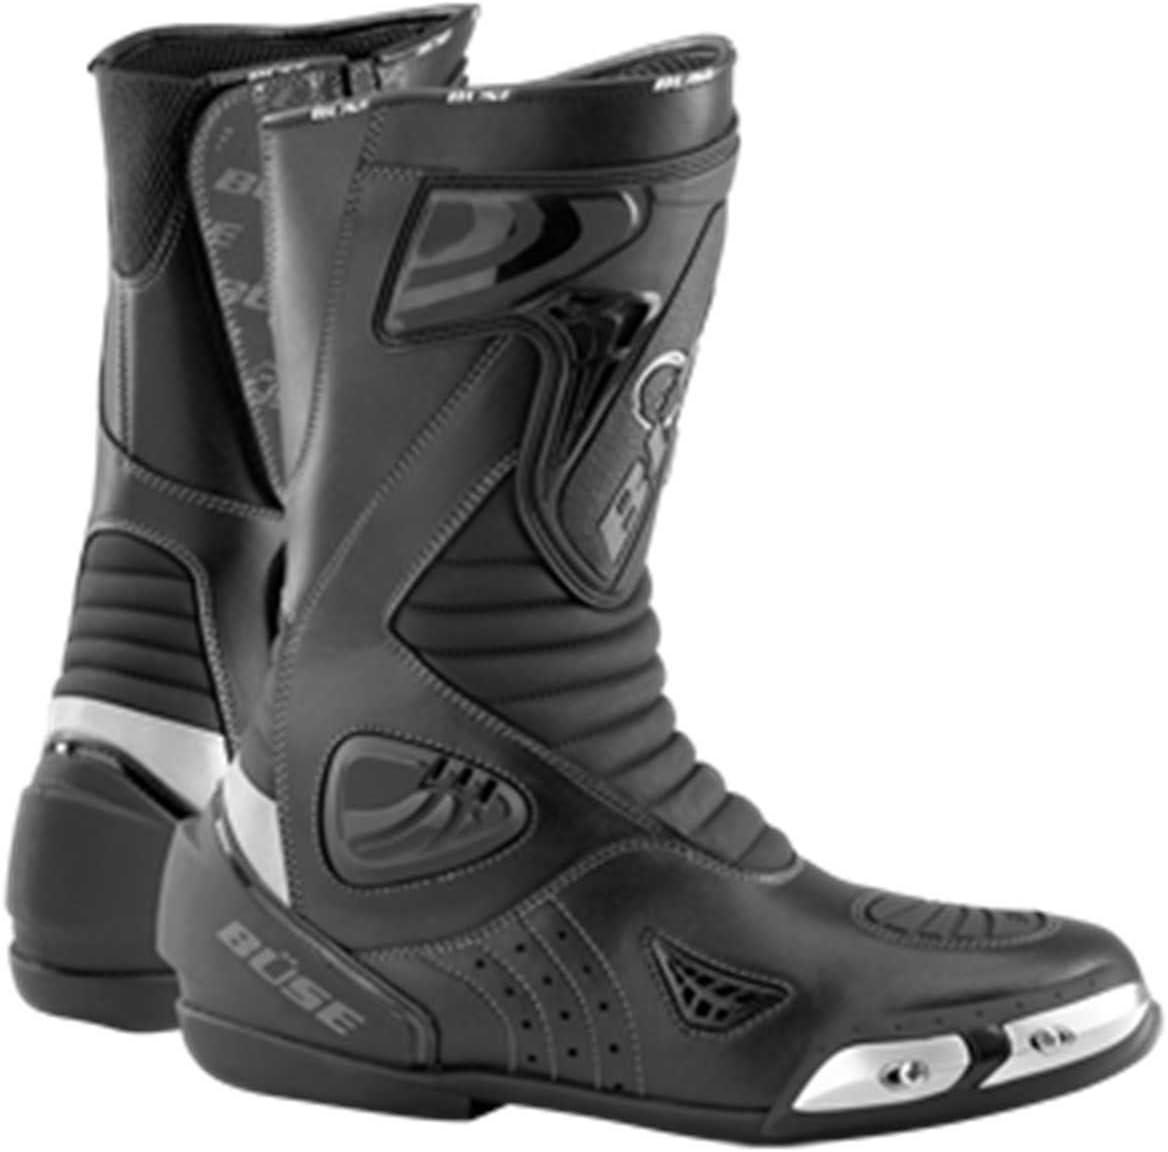 B/üse 512206-40 Sport Stiefel wei/ß//schw 40